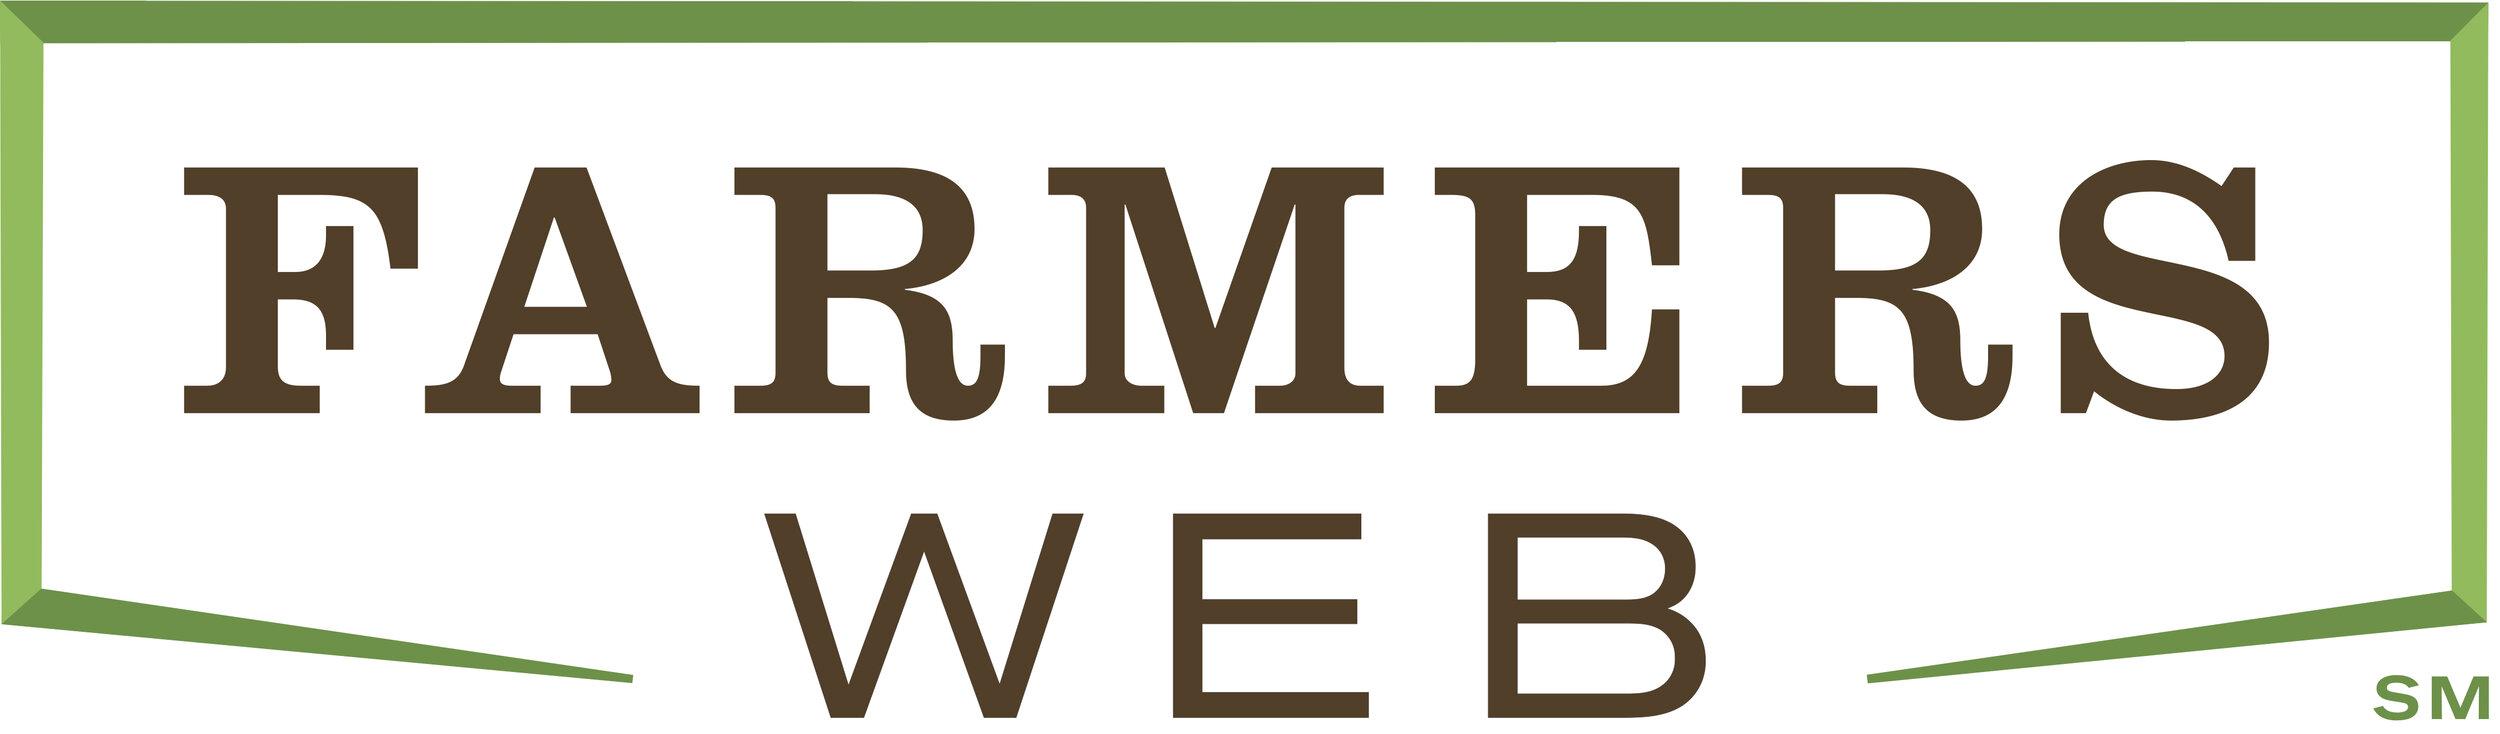 FarmersWeb_Logo_White_Brown.jpg